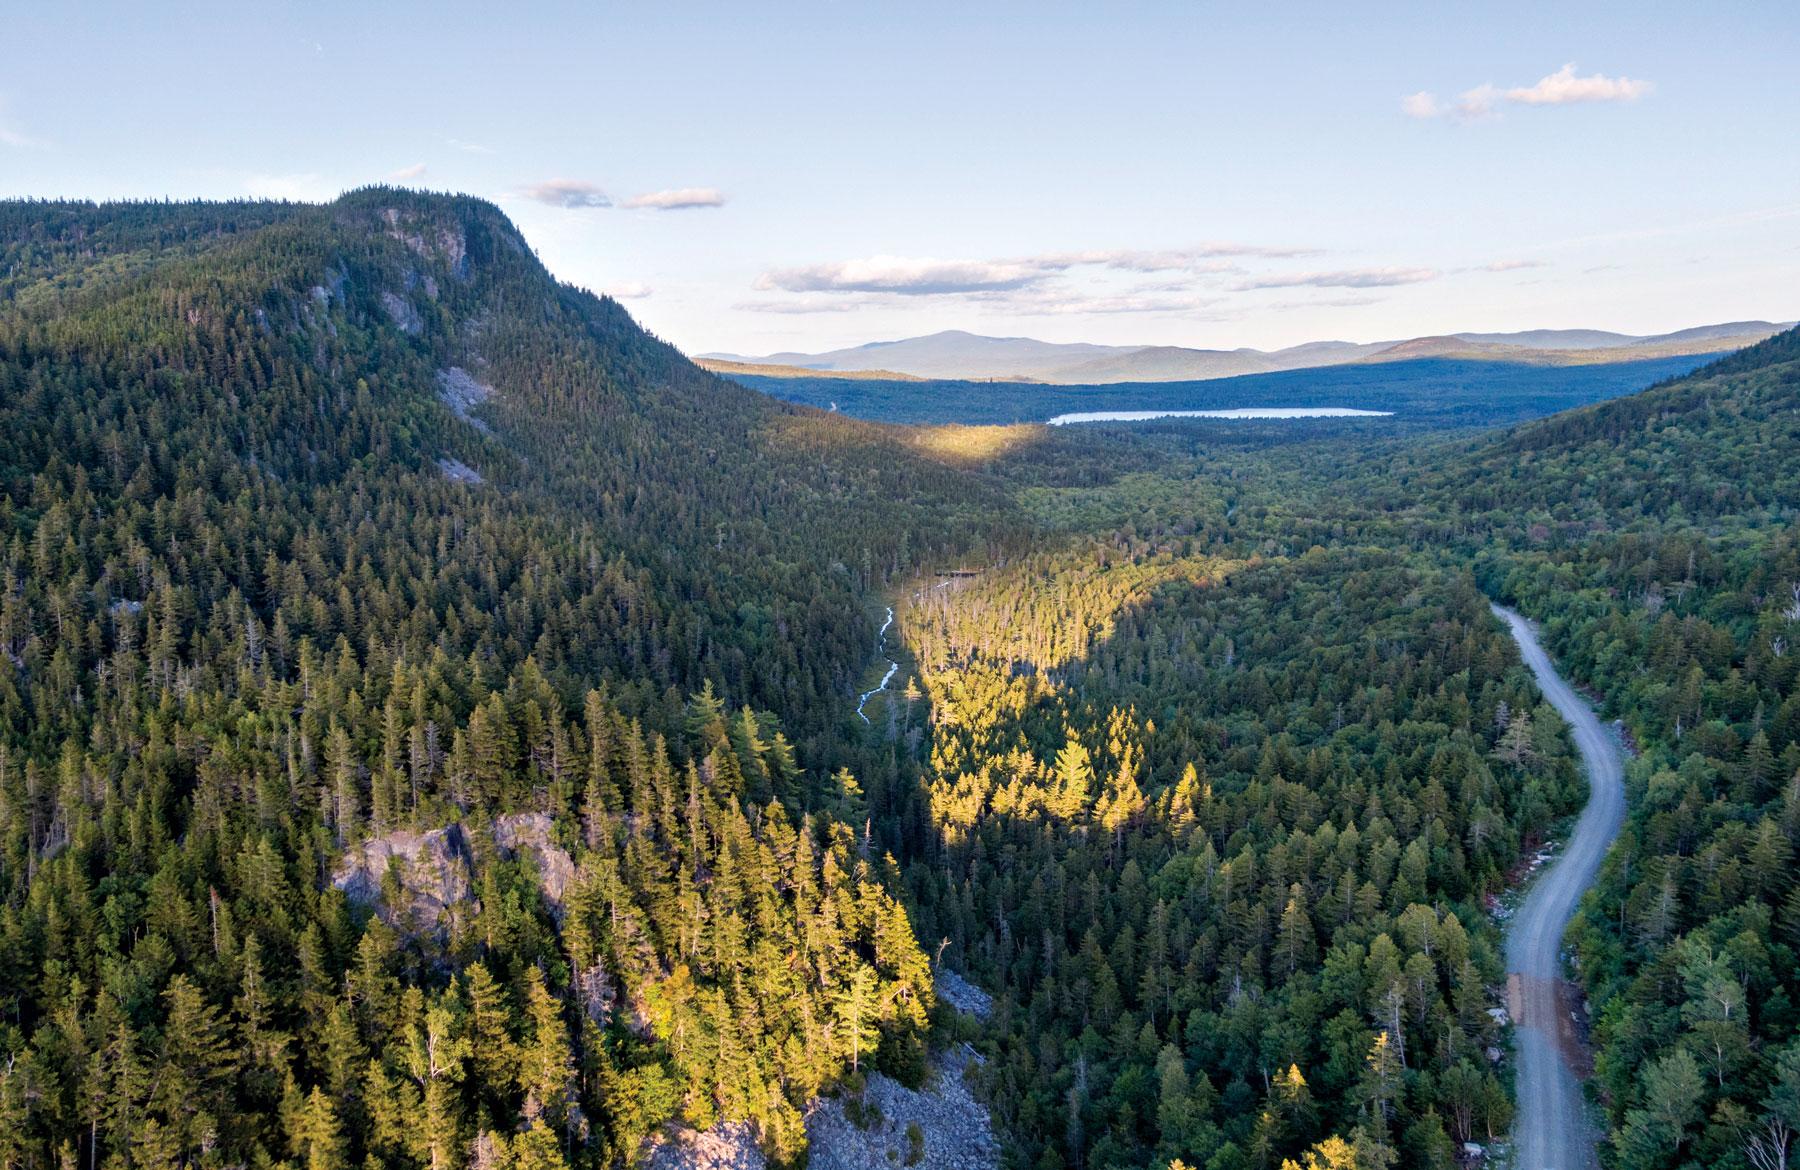 Greenlaw Mountain